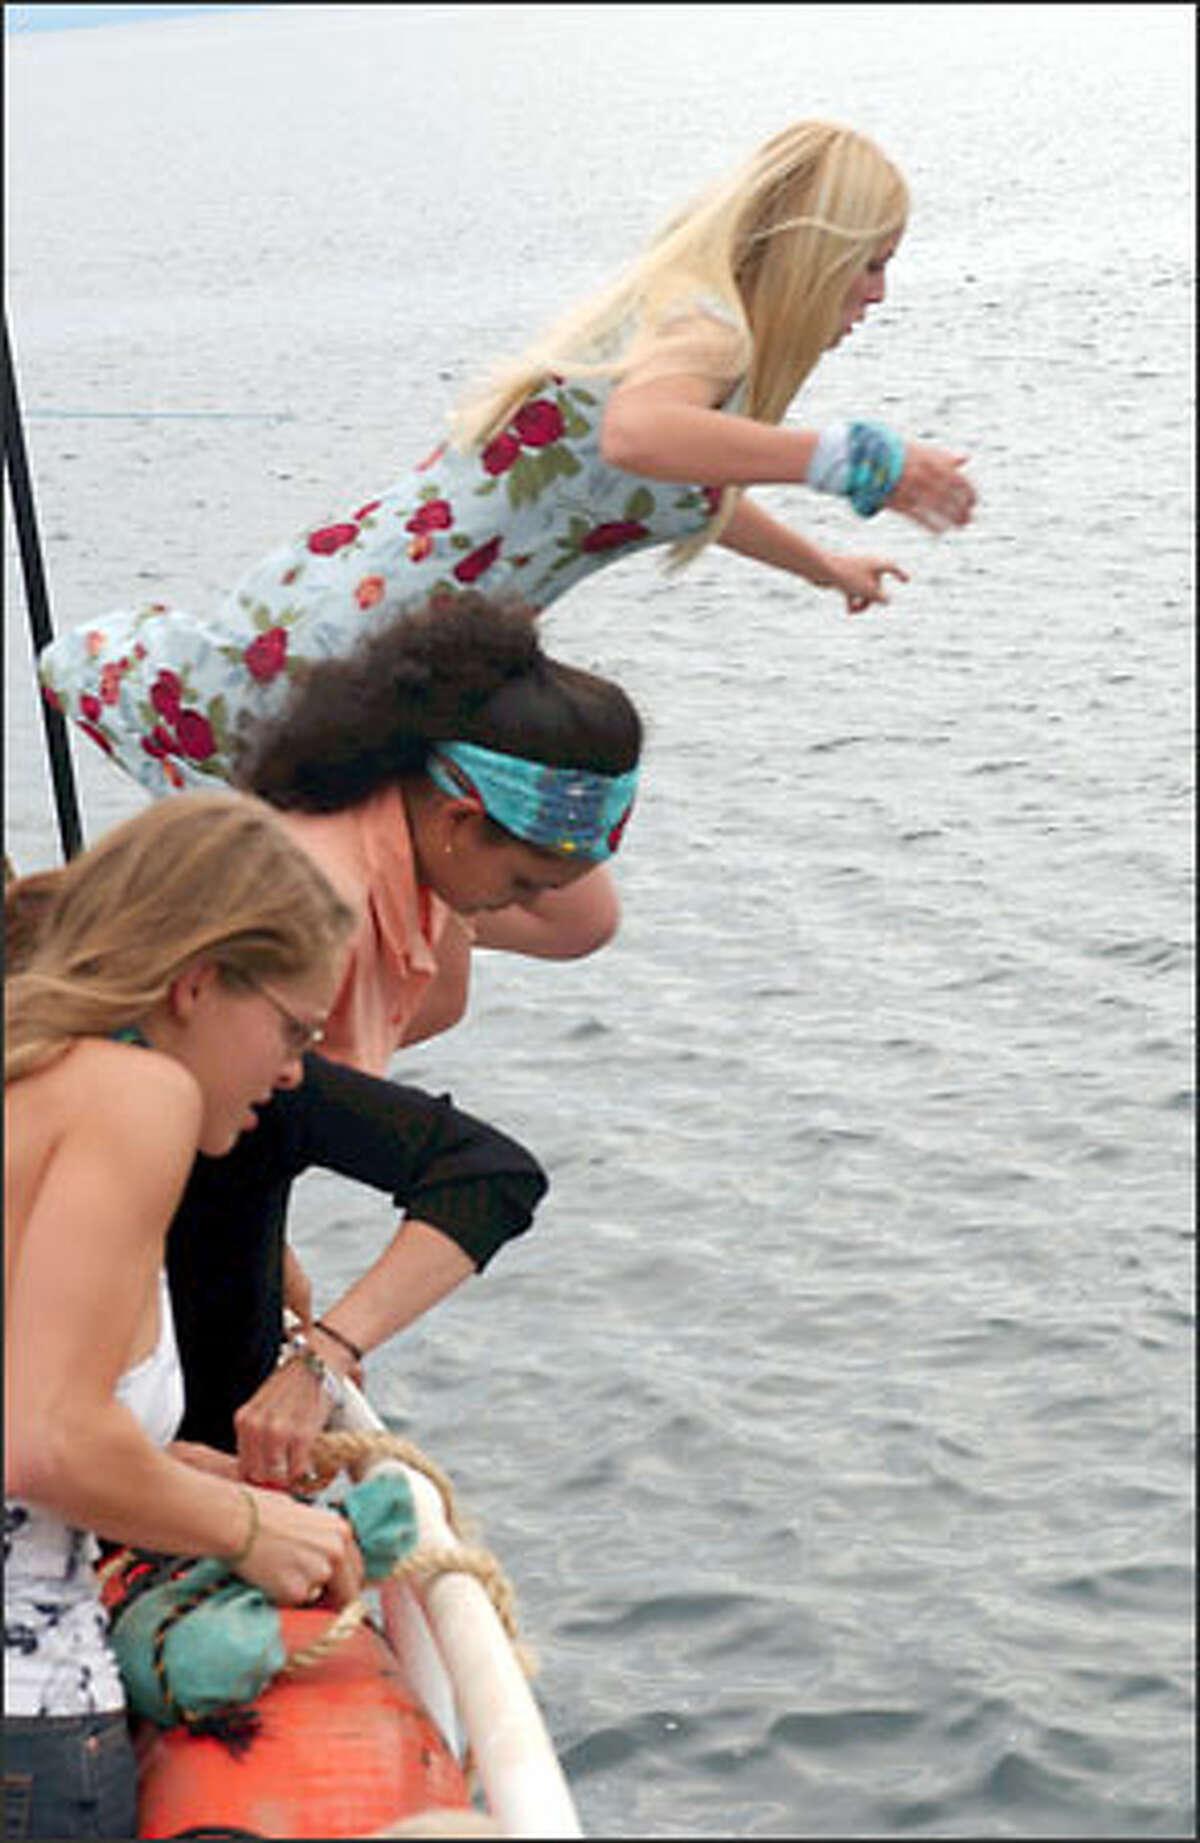 Christa Hastie, Sandra Diaz-Twine and Michelle Tesauro jump ship rather than walk the plank.